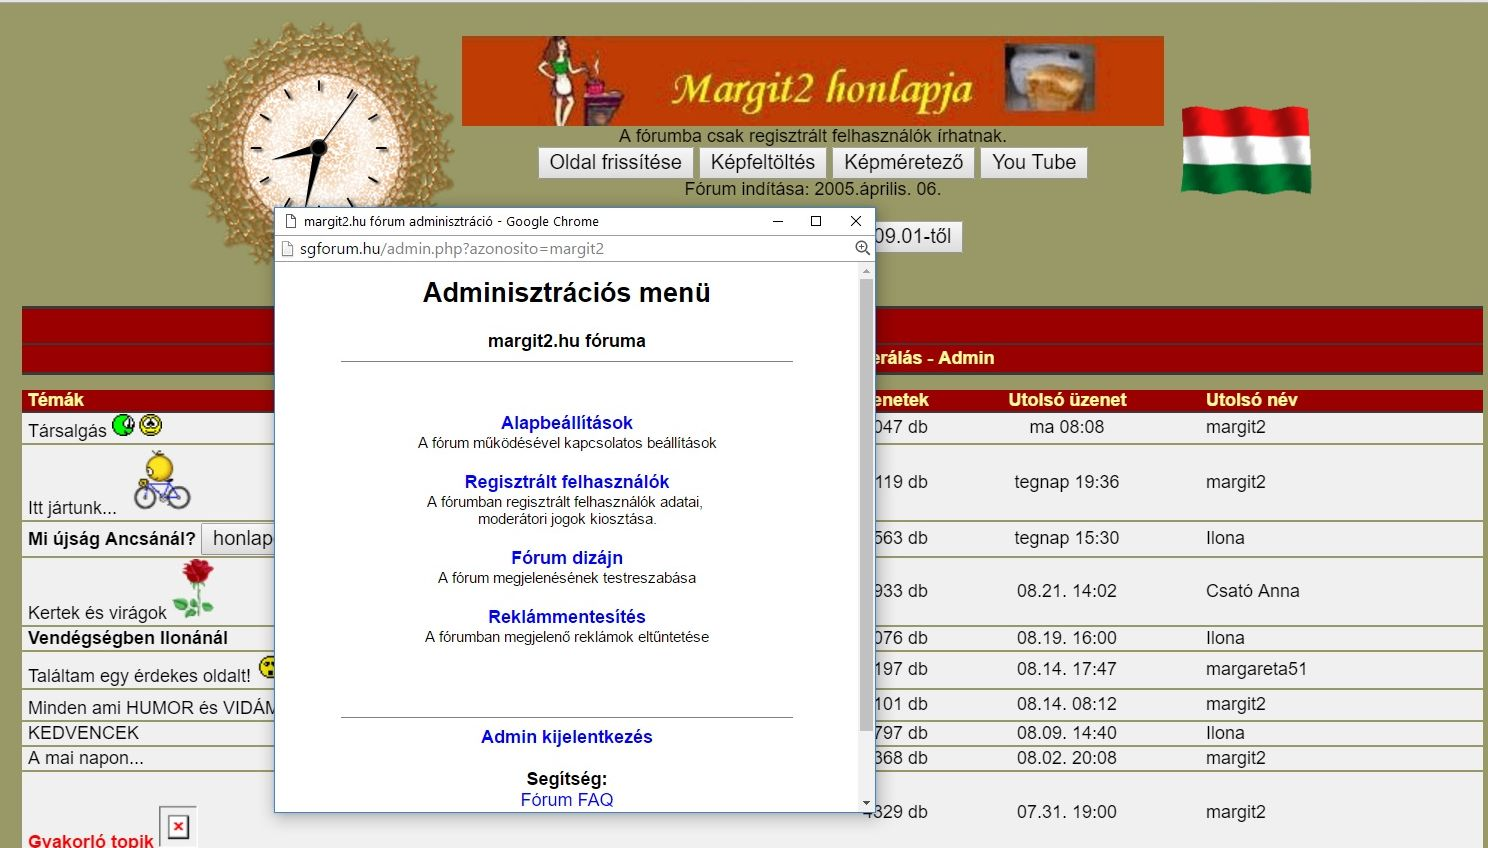 http://margit2.hu/ujforumba/regiadmin.jpg